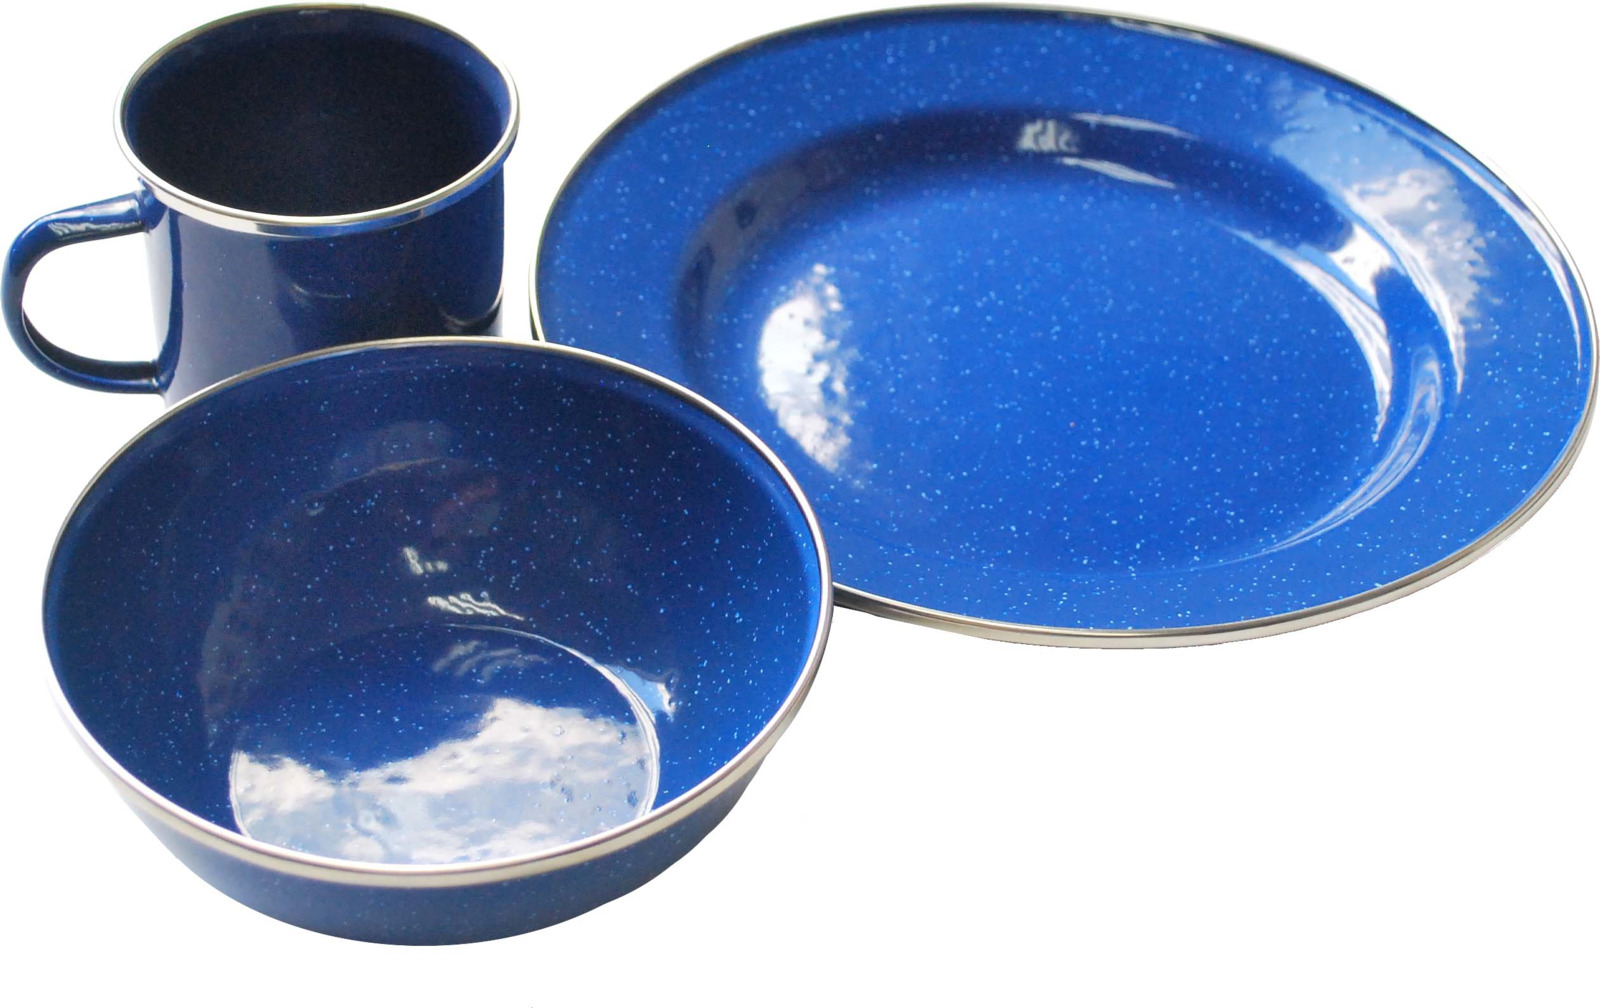 Набор походной посуды Tramp, цвет: синий. TRC-074 tramp trc 029